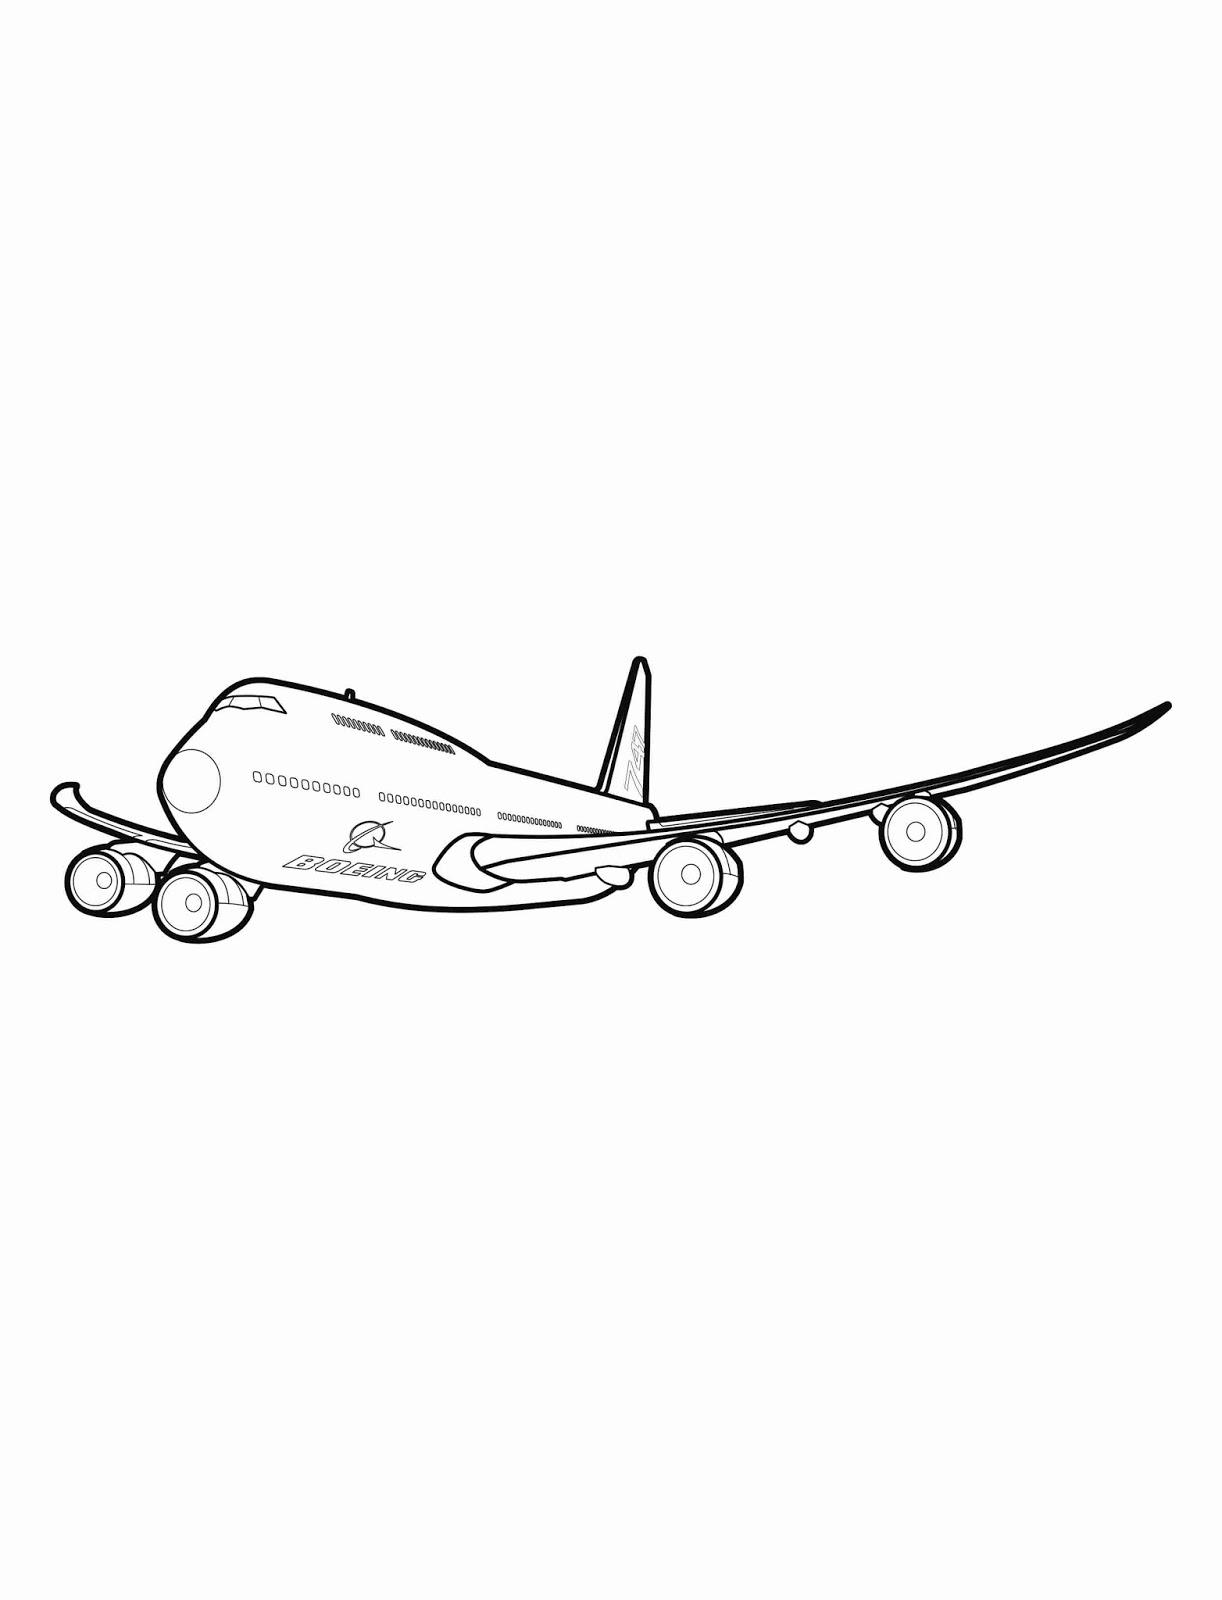 Sketsa Gambar Pesawat : sketsa, gambar, pesawat, Contoh, Gambar, Mewarnai, Pesawat, Boeing, KataUcap